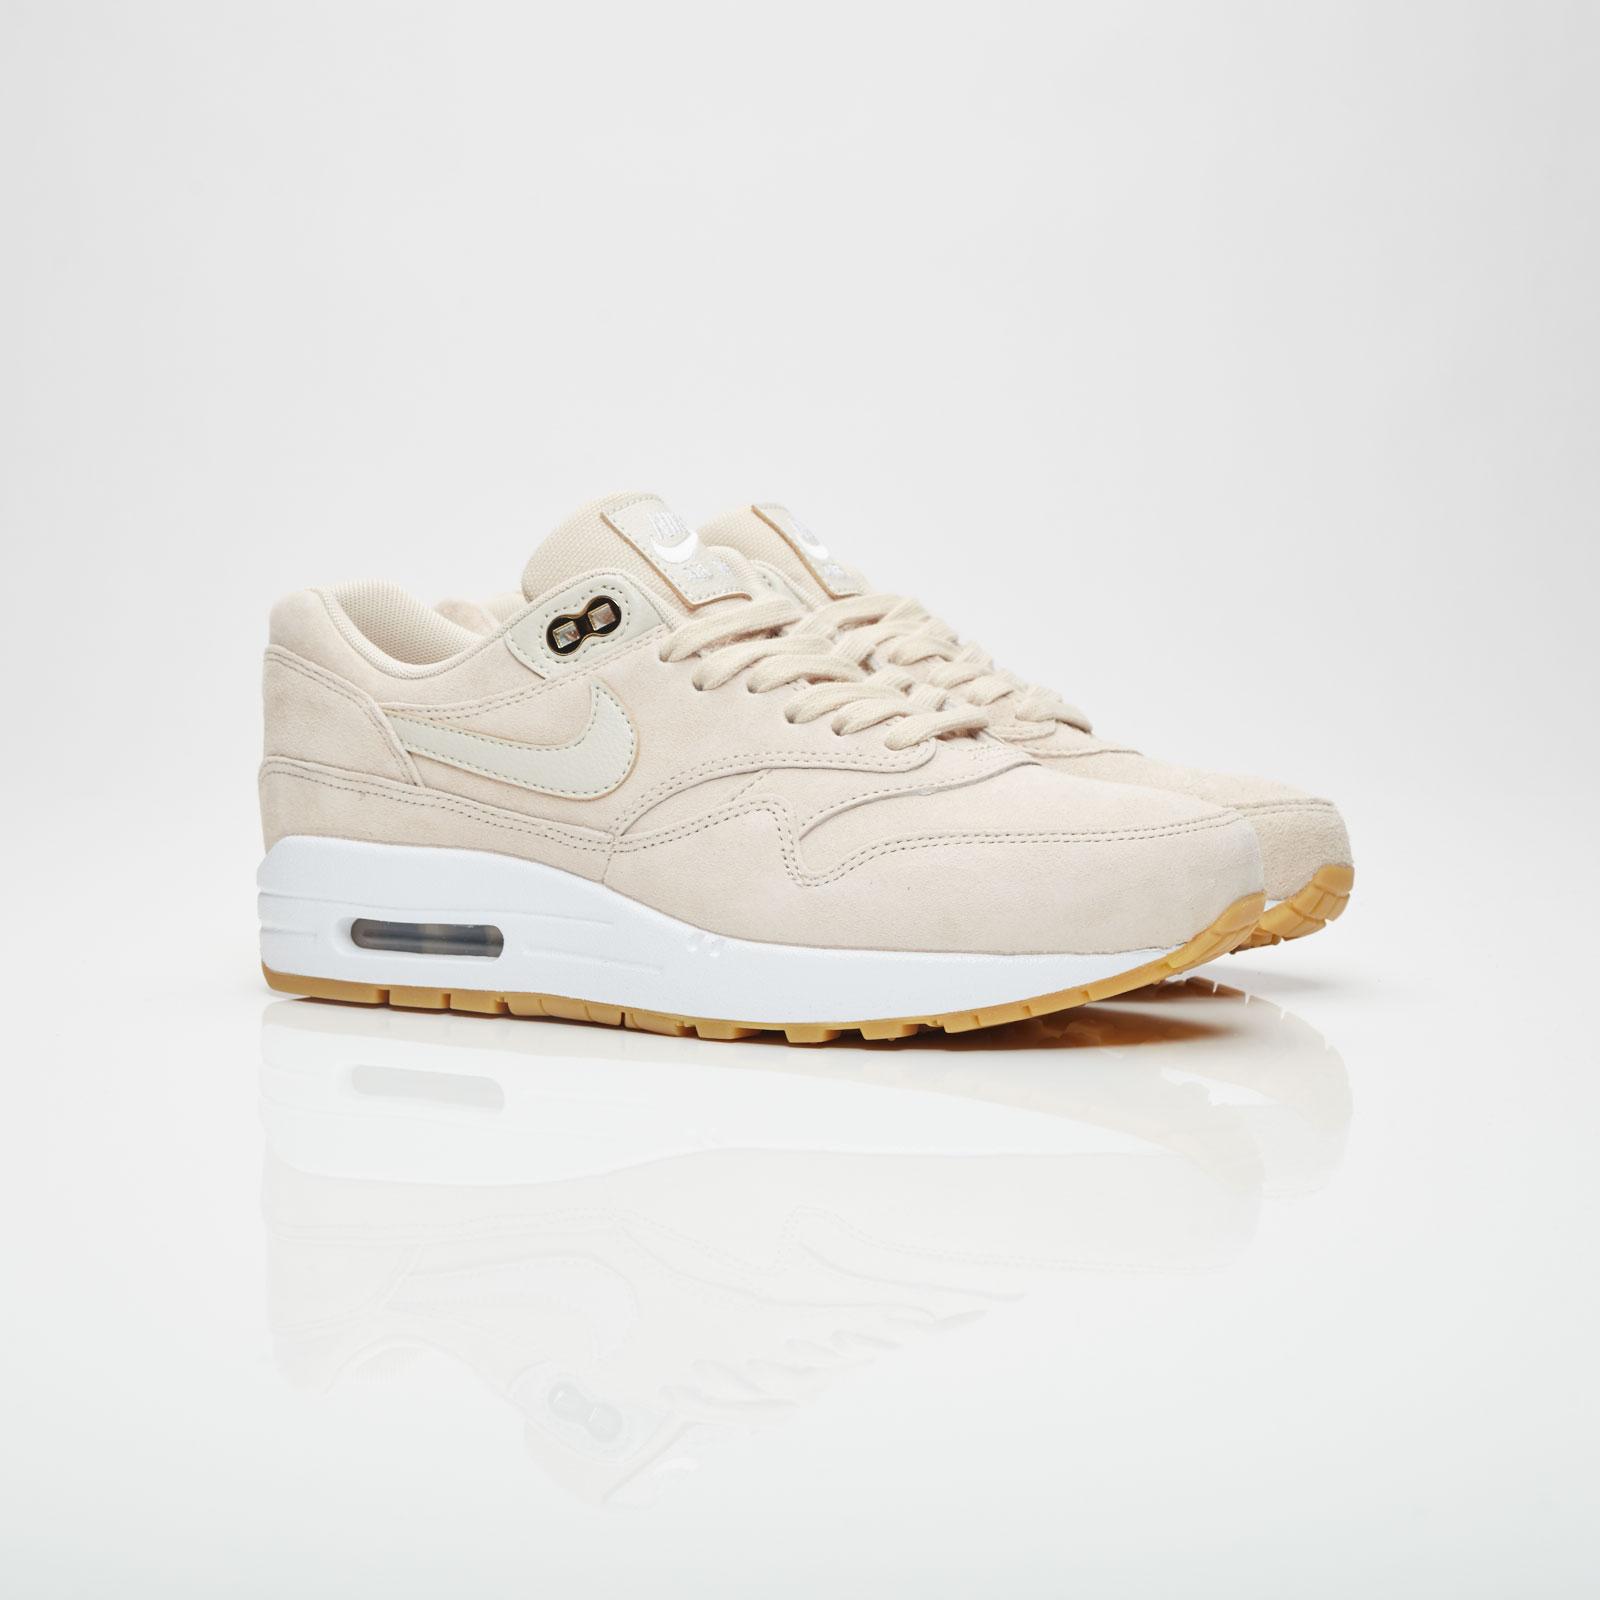 95592b252dc Nike Wmns Air Max 1 SD - 919484-100 - Sneakersnstuff